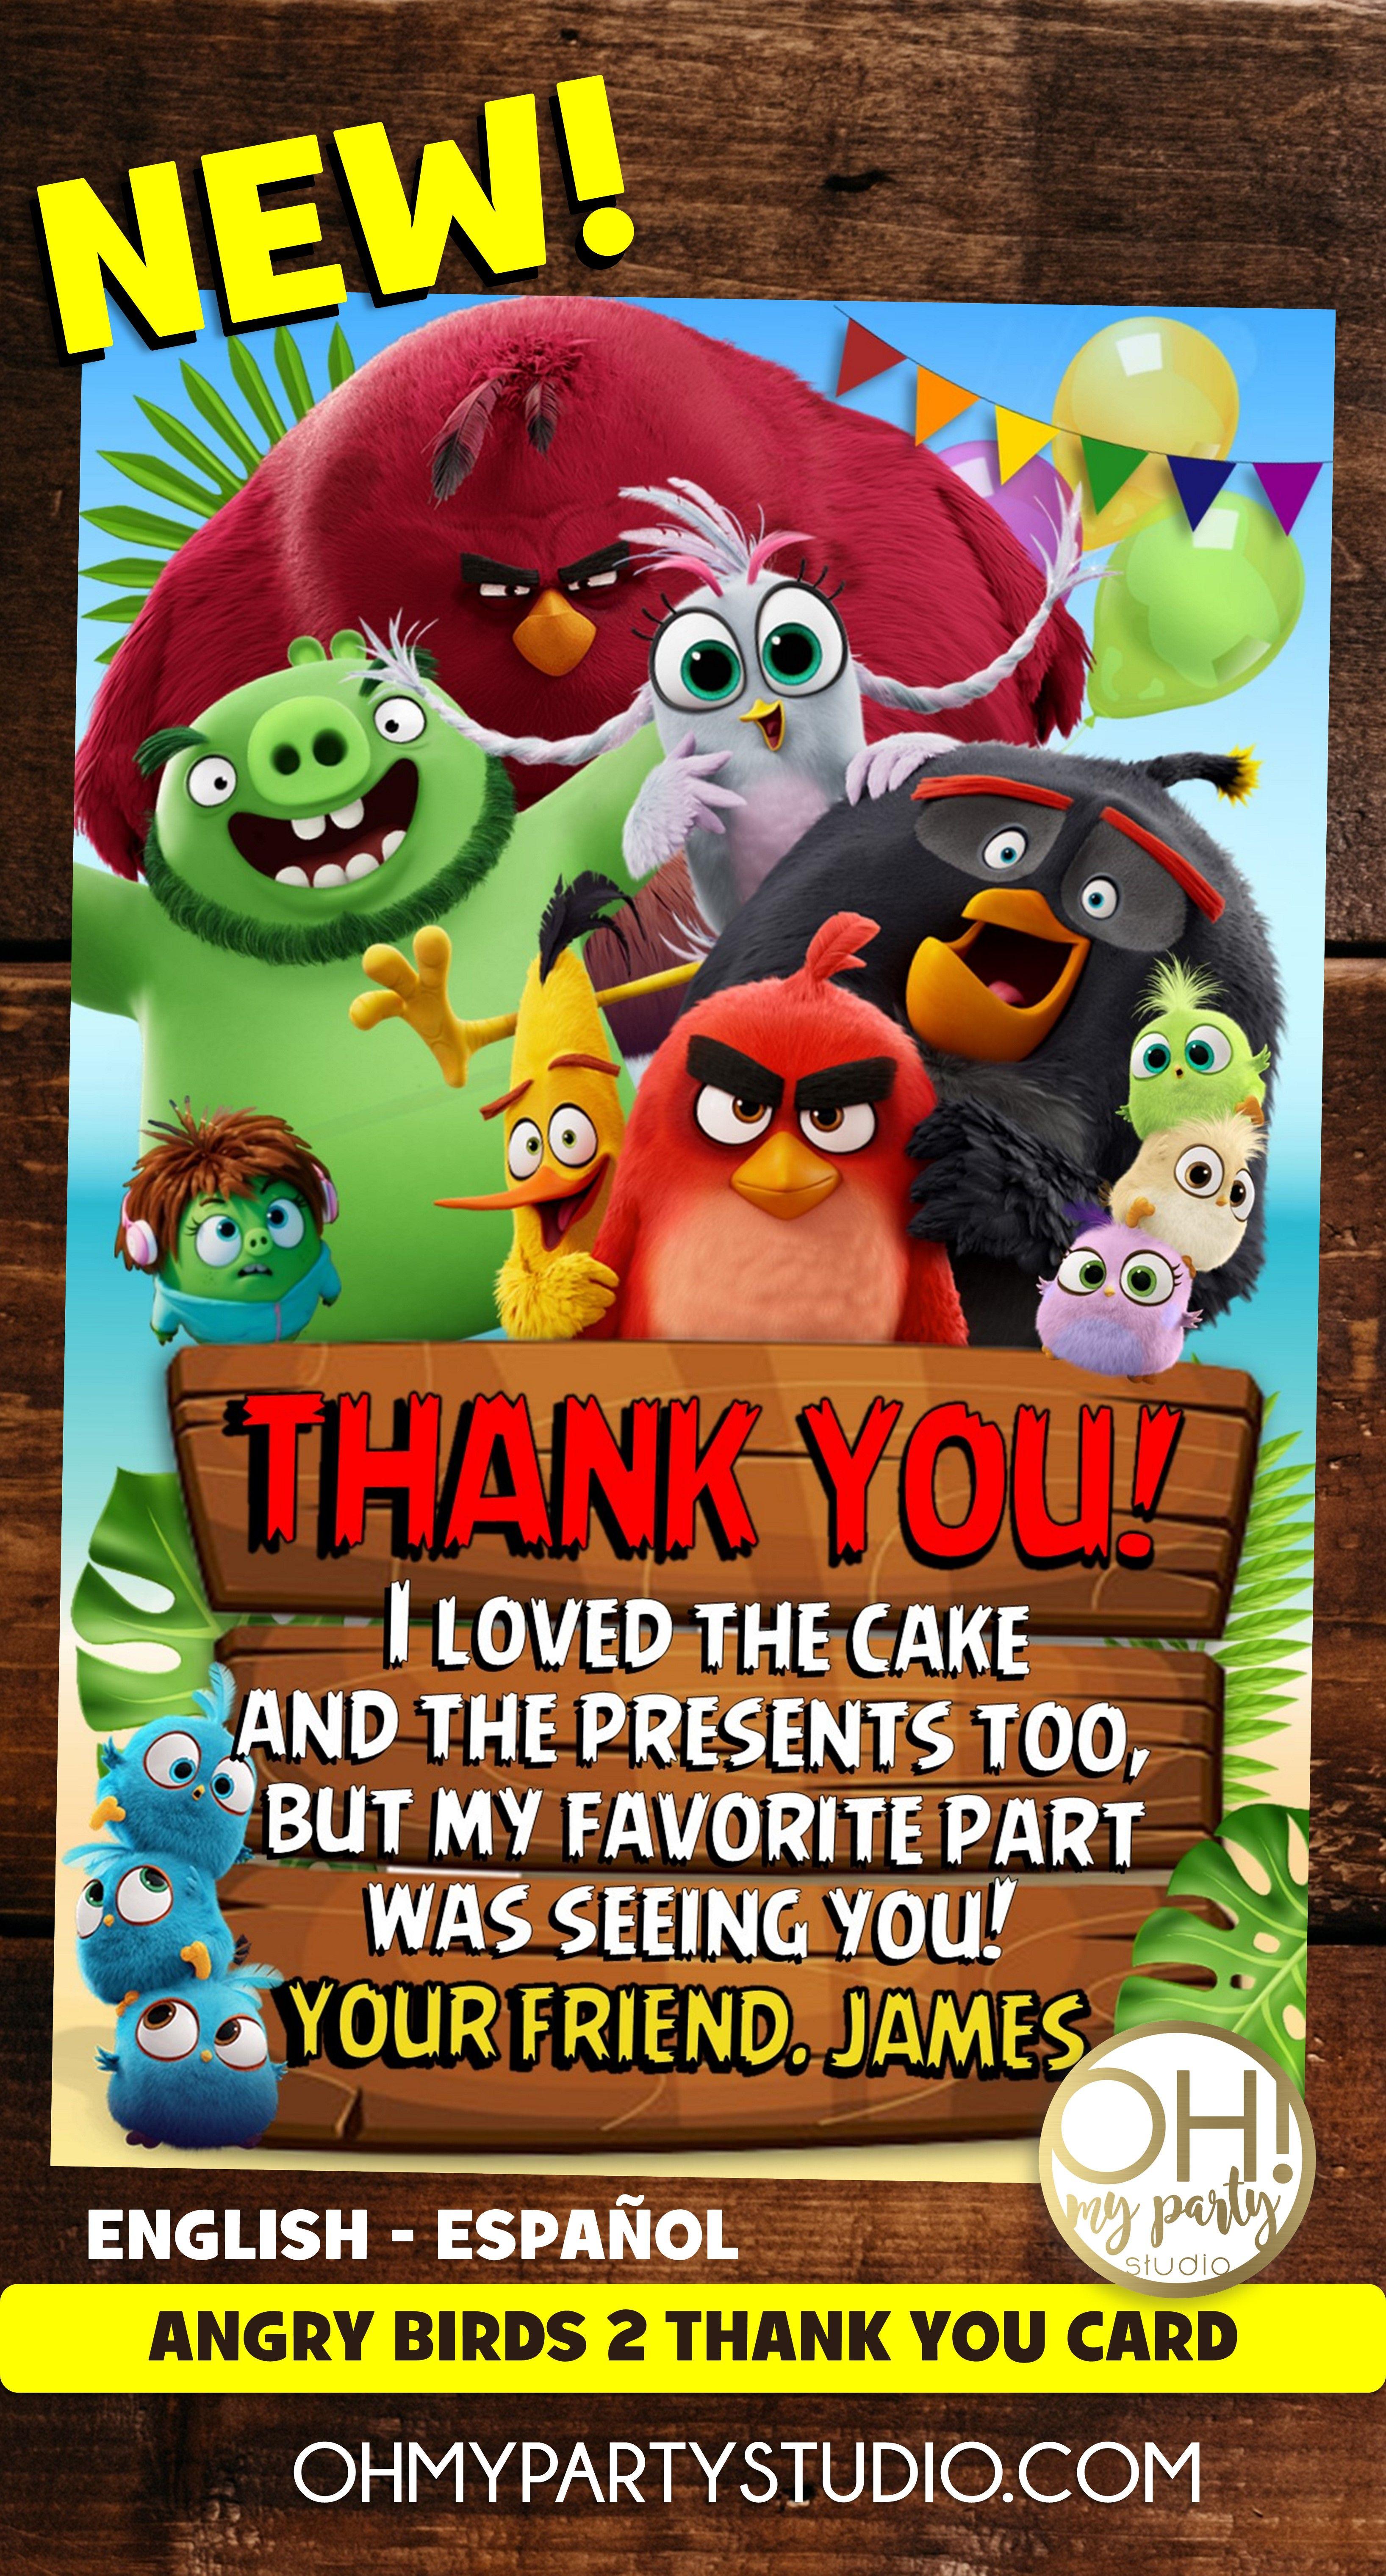 Angry Birds Party Angry Birds 2 Angry Birds 2 Thank You Card Angry Birds Movie Thank You Card Angry Birds Party Angry Birds Angry Birds Movie